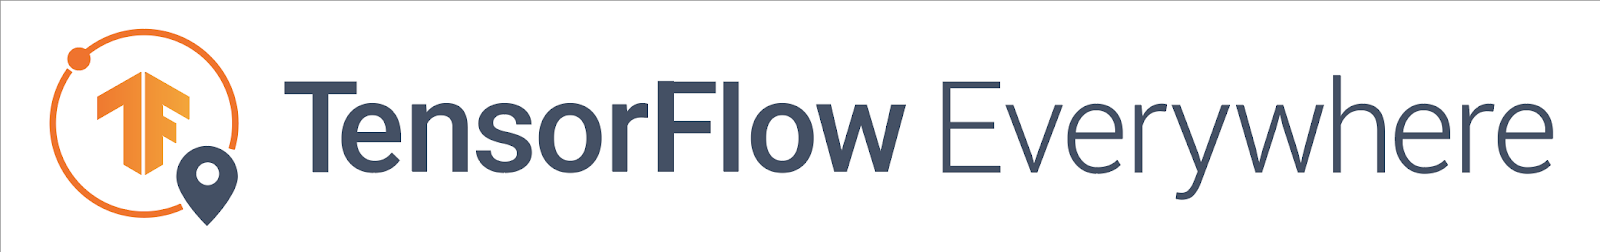 TensorFlow Everywhere logo